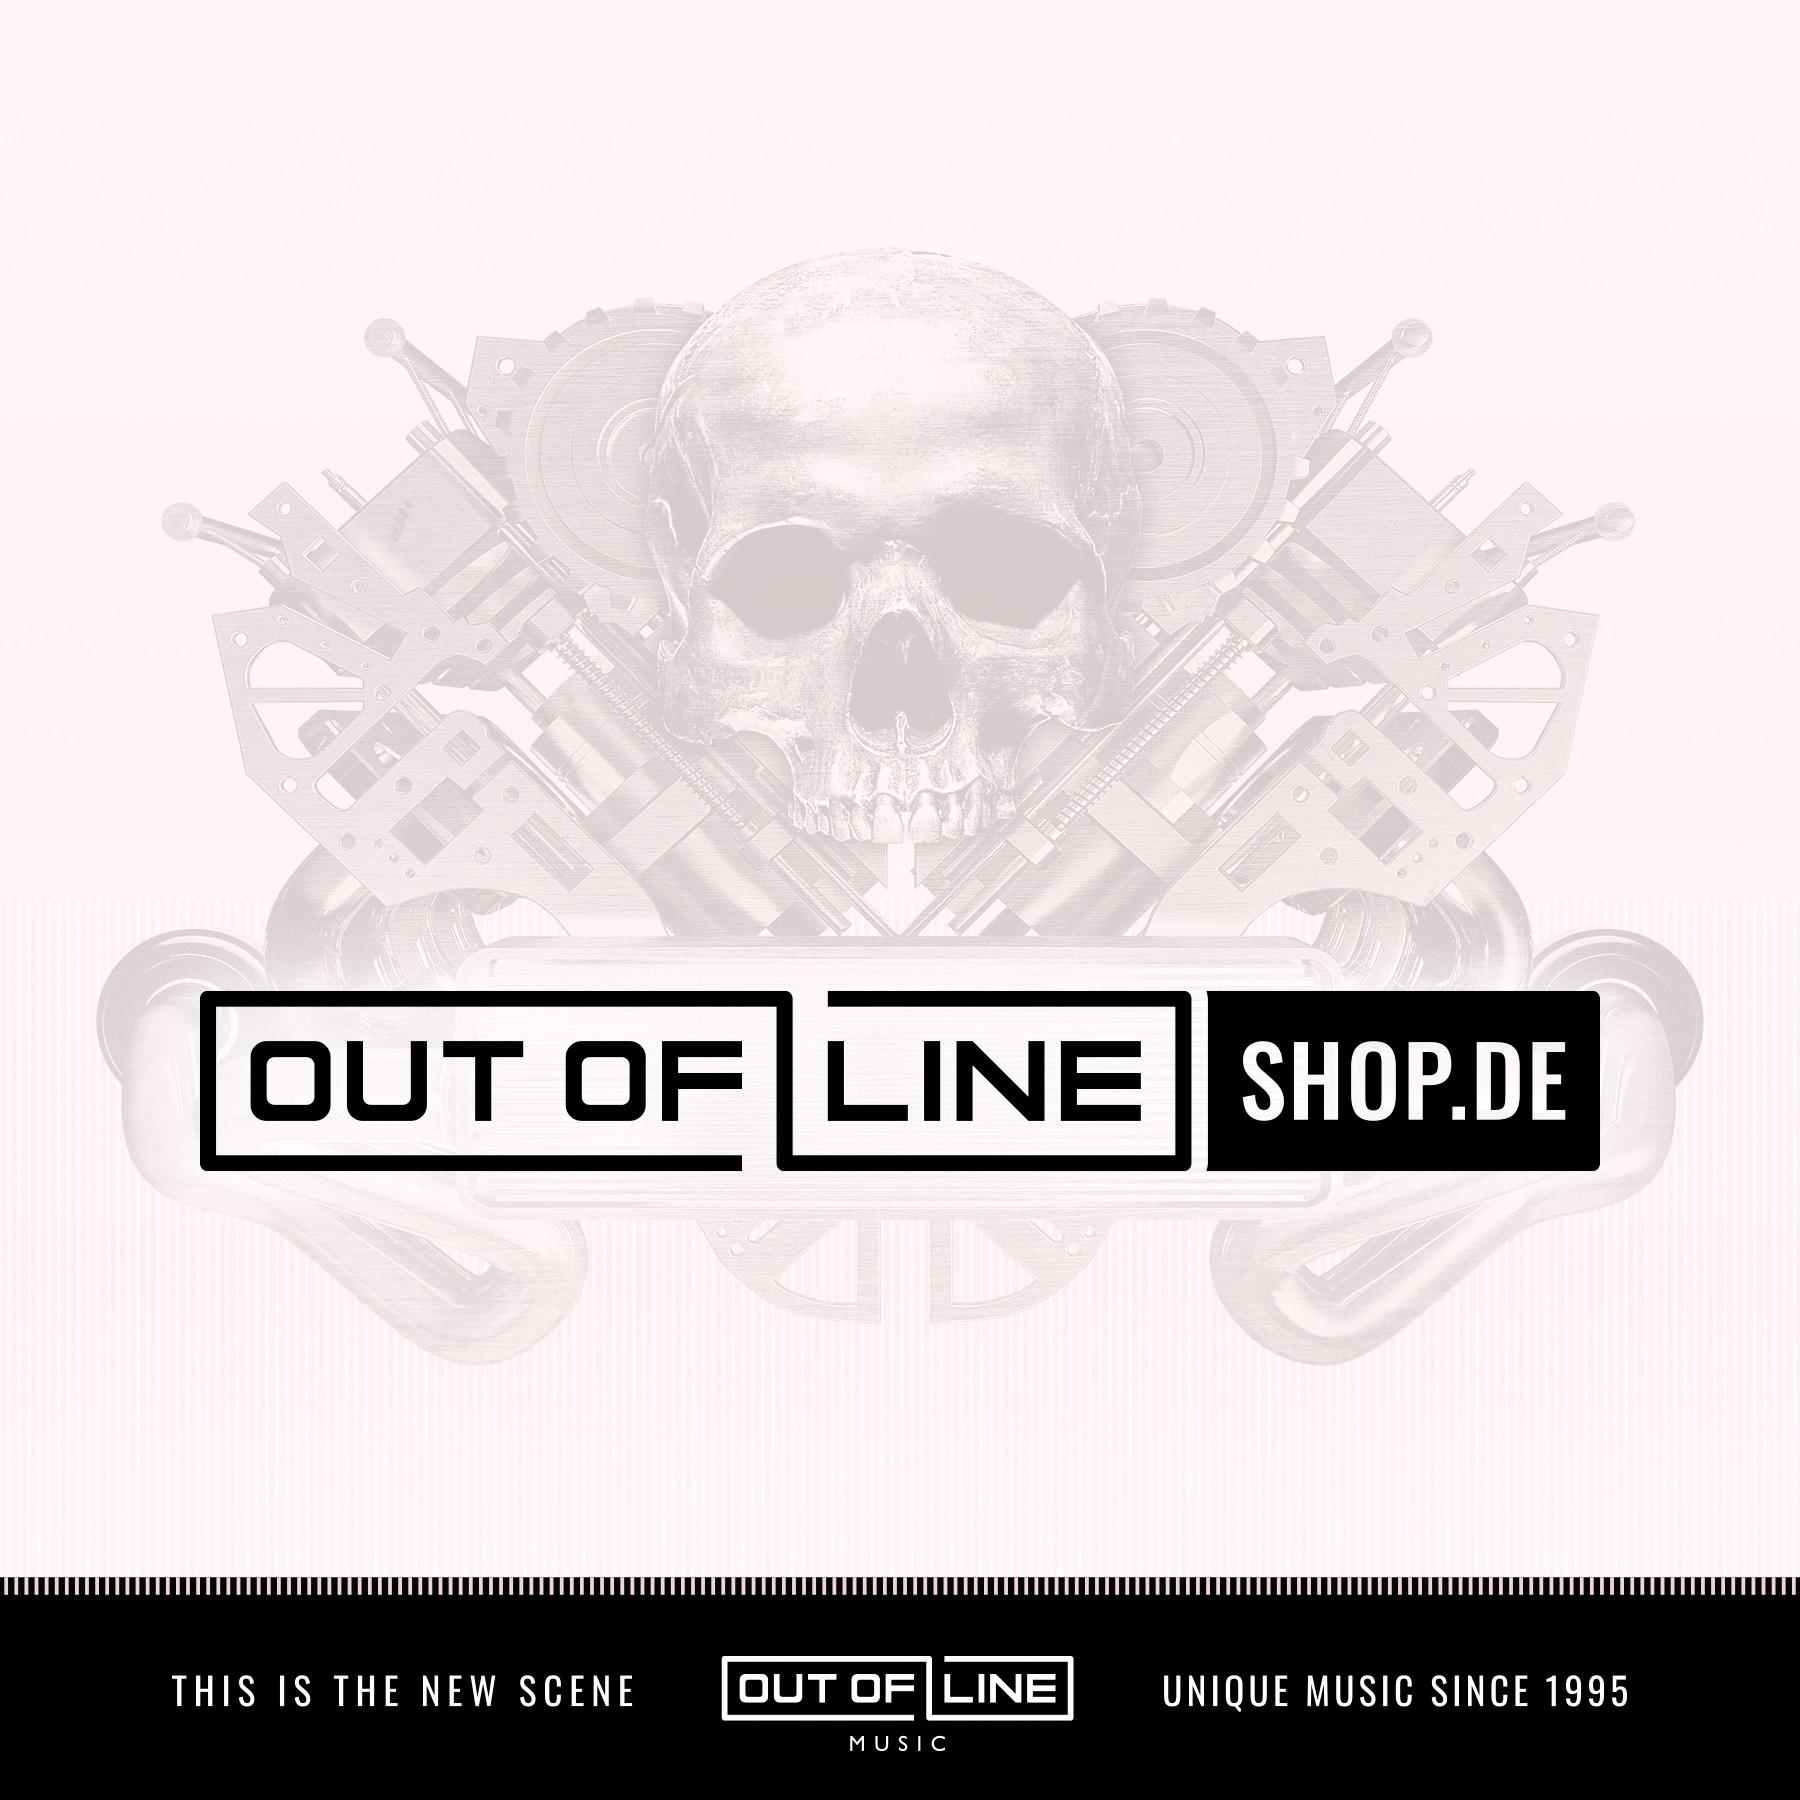 Seeming - The Birdwatcher's Guide To Atrocity - 2CD